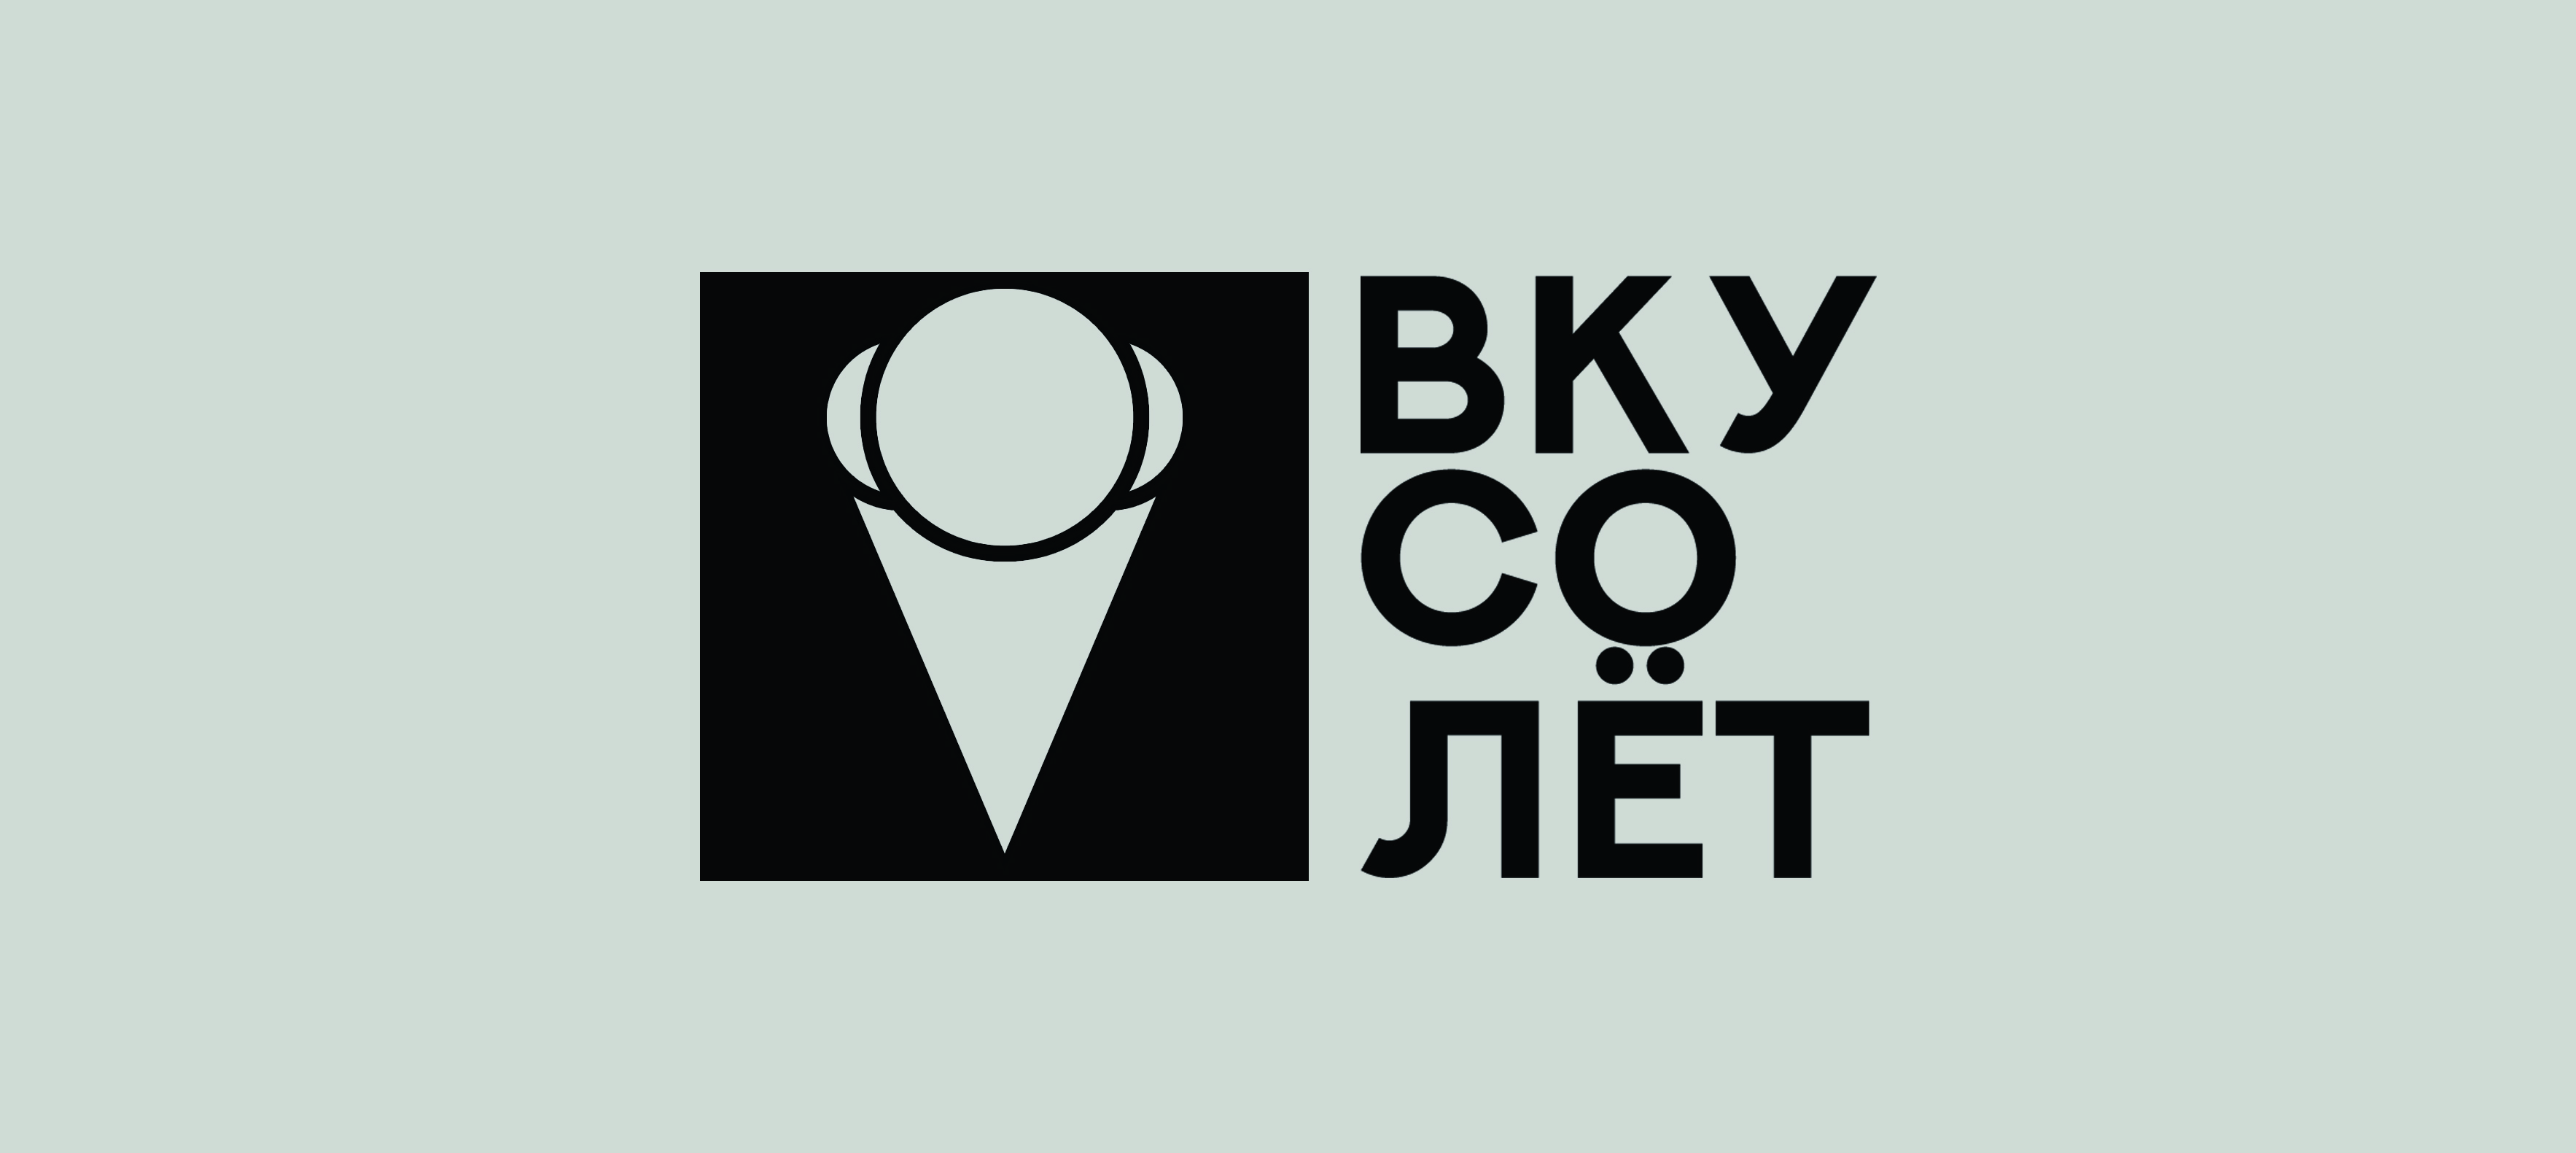 Логотип для доставки еды фото f_06959d3df2ba56d3.jpg